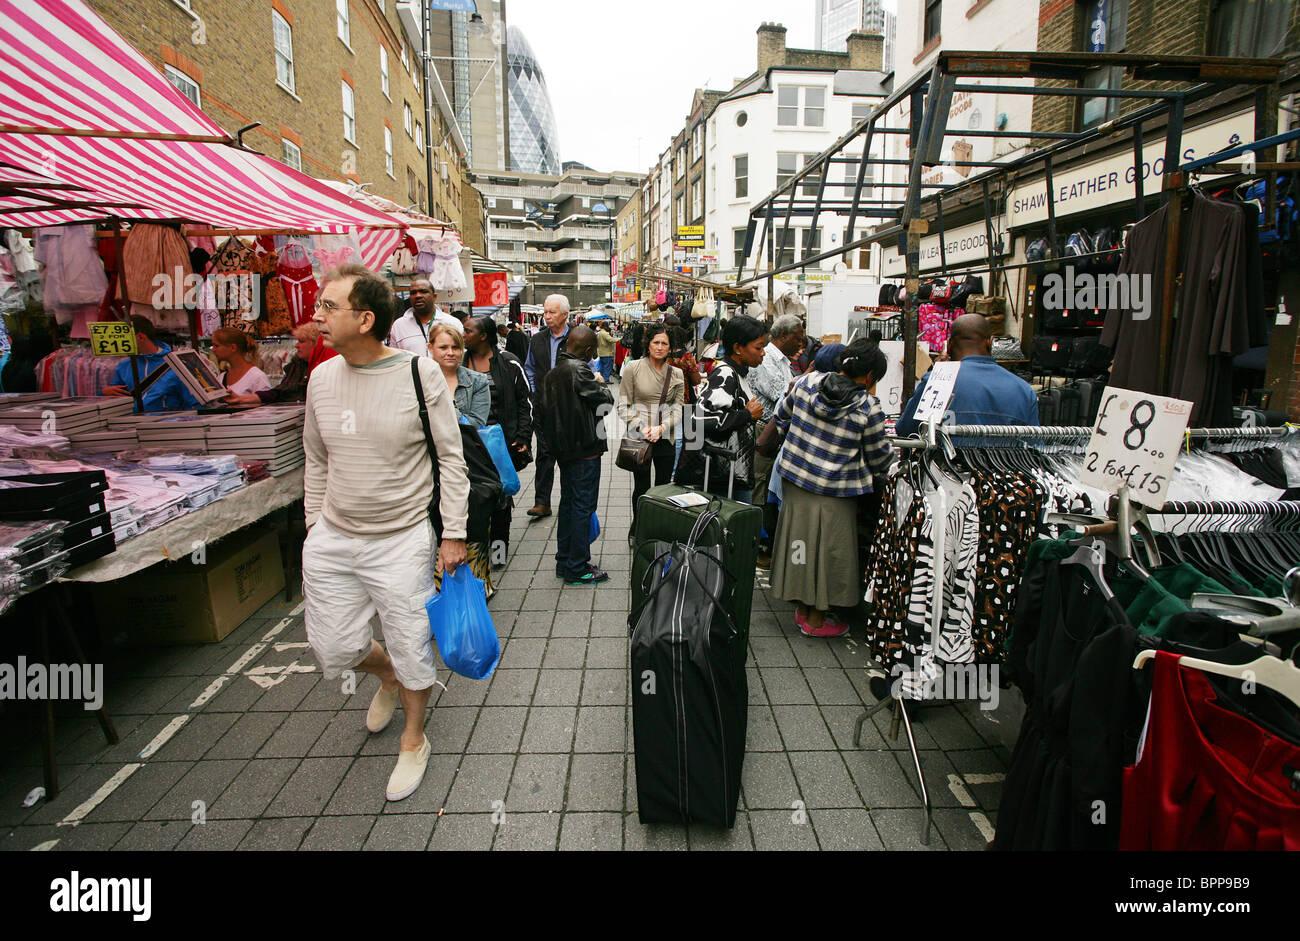 Petticoat Lane Market, east London UK - Stock Image